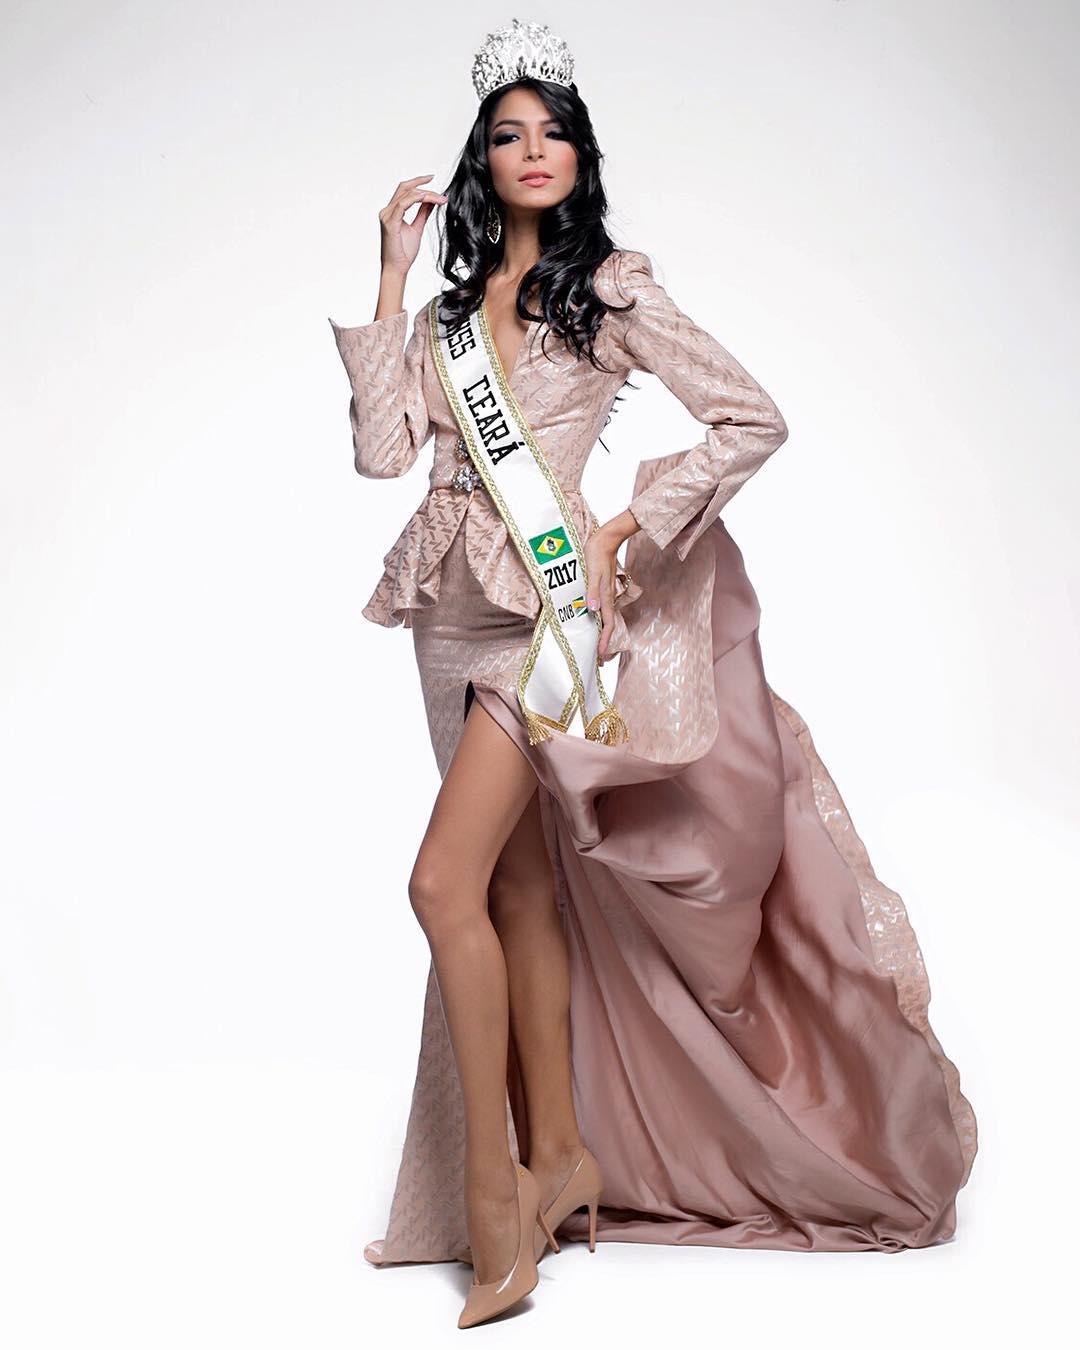 miss ceara mundo 2017, renata miranda. 18580211